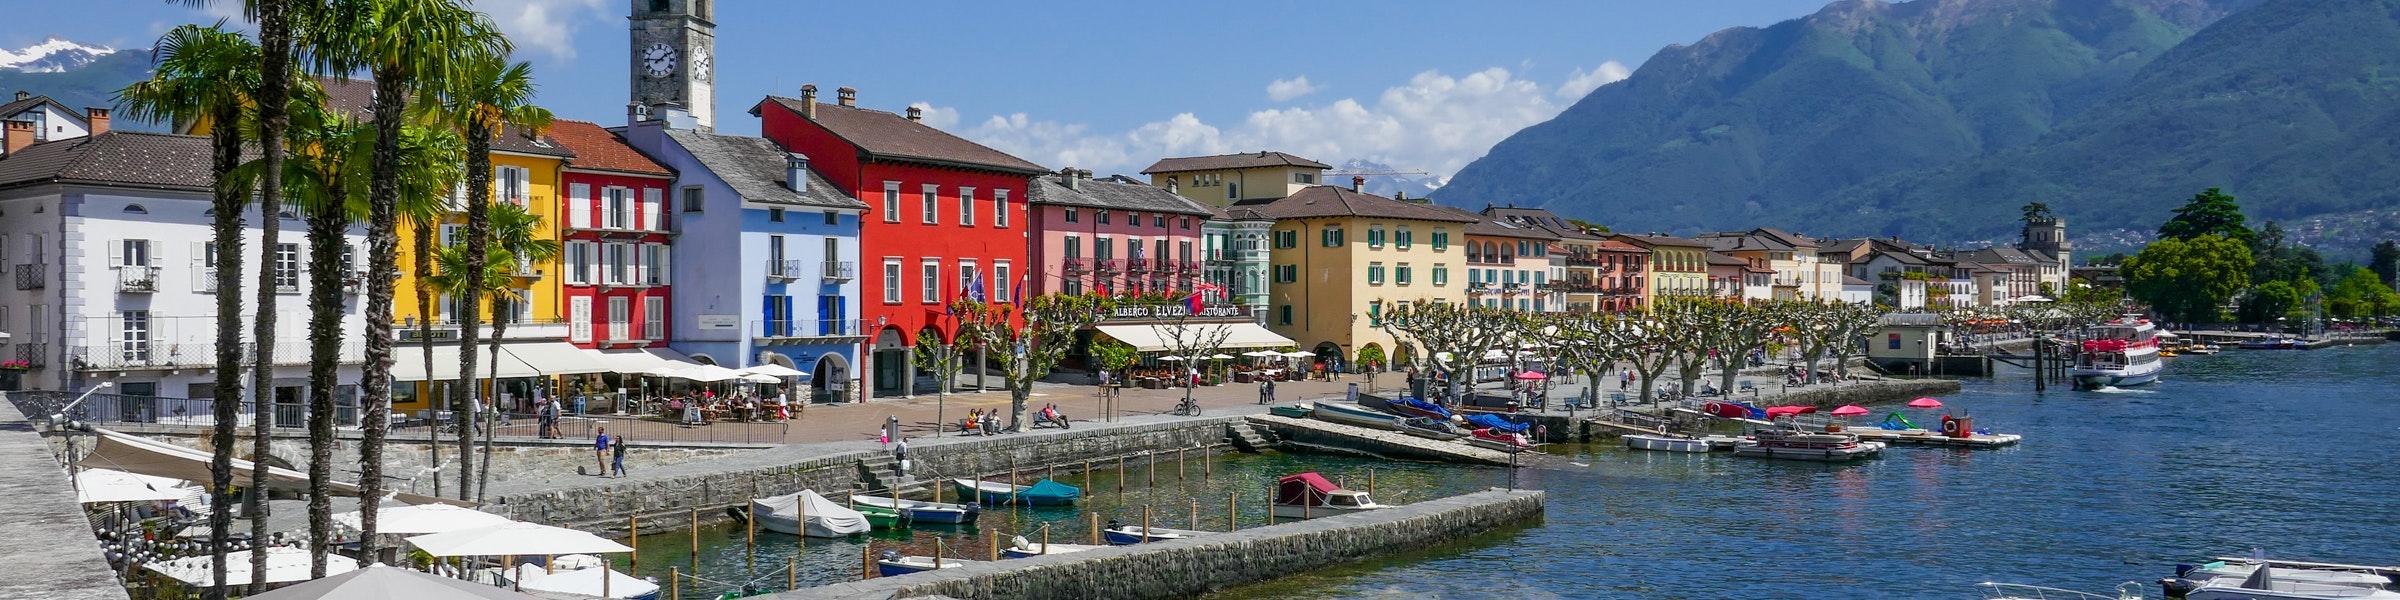 Ascona boulevard